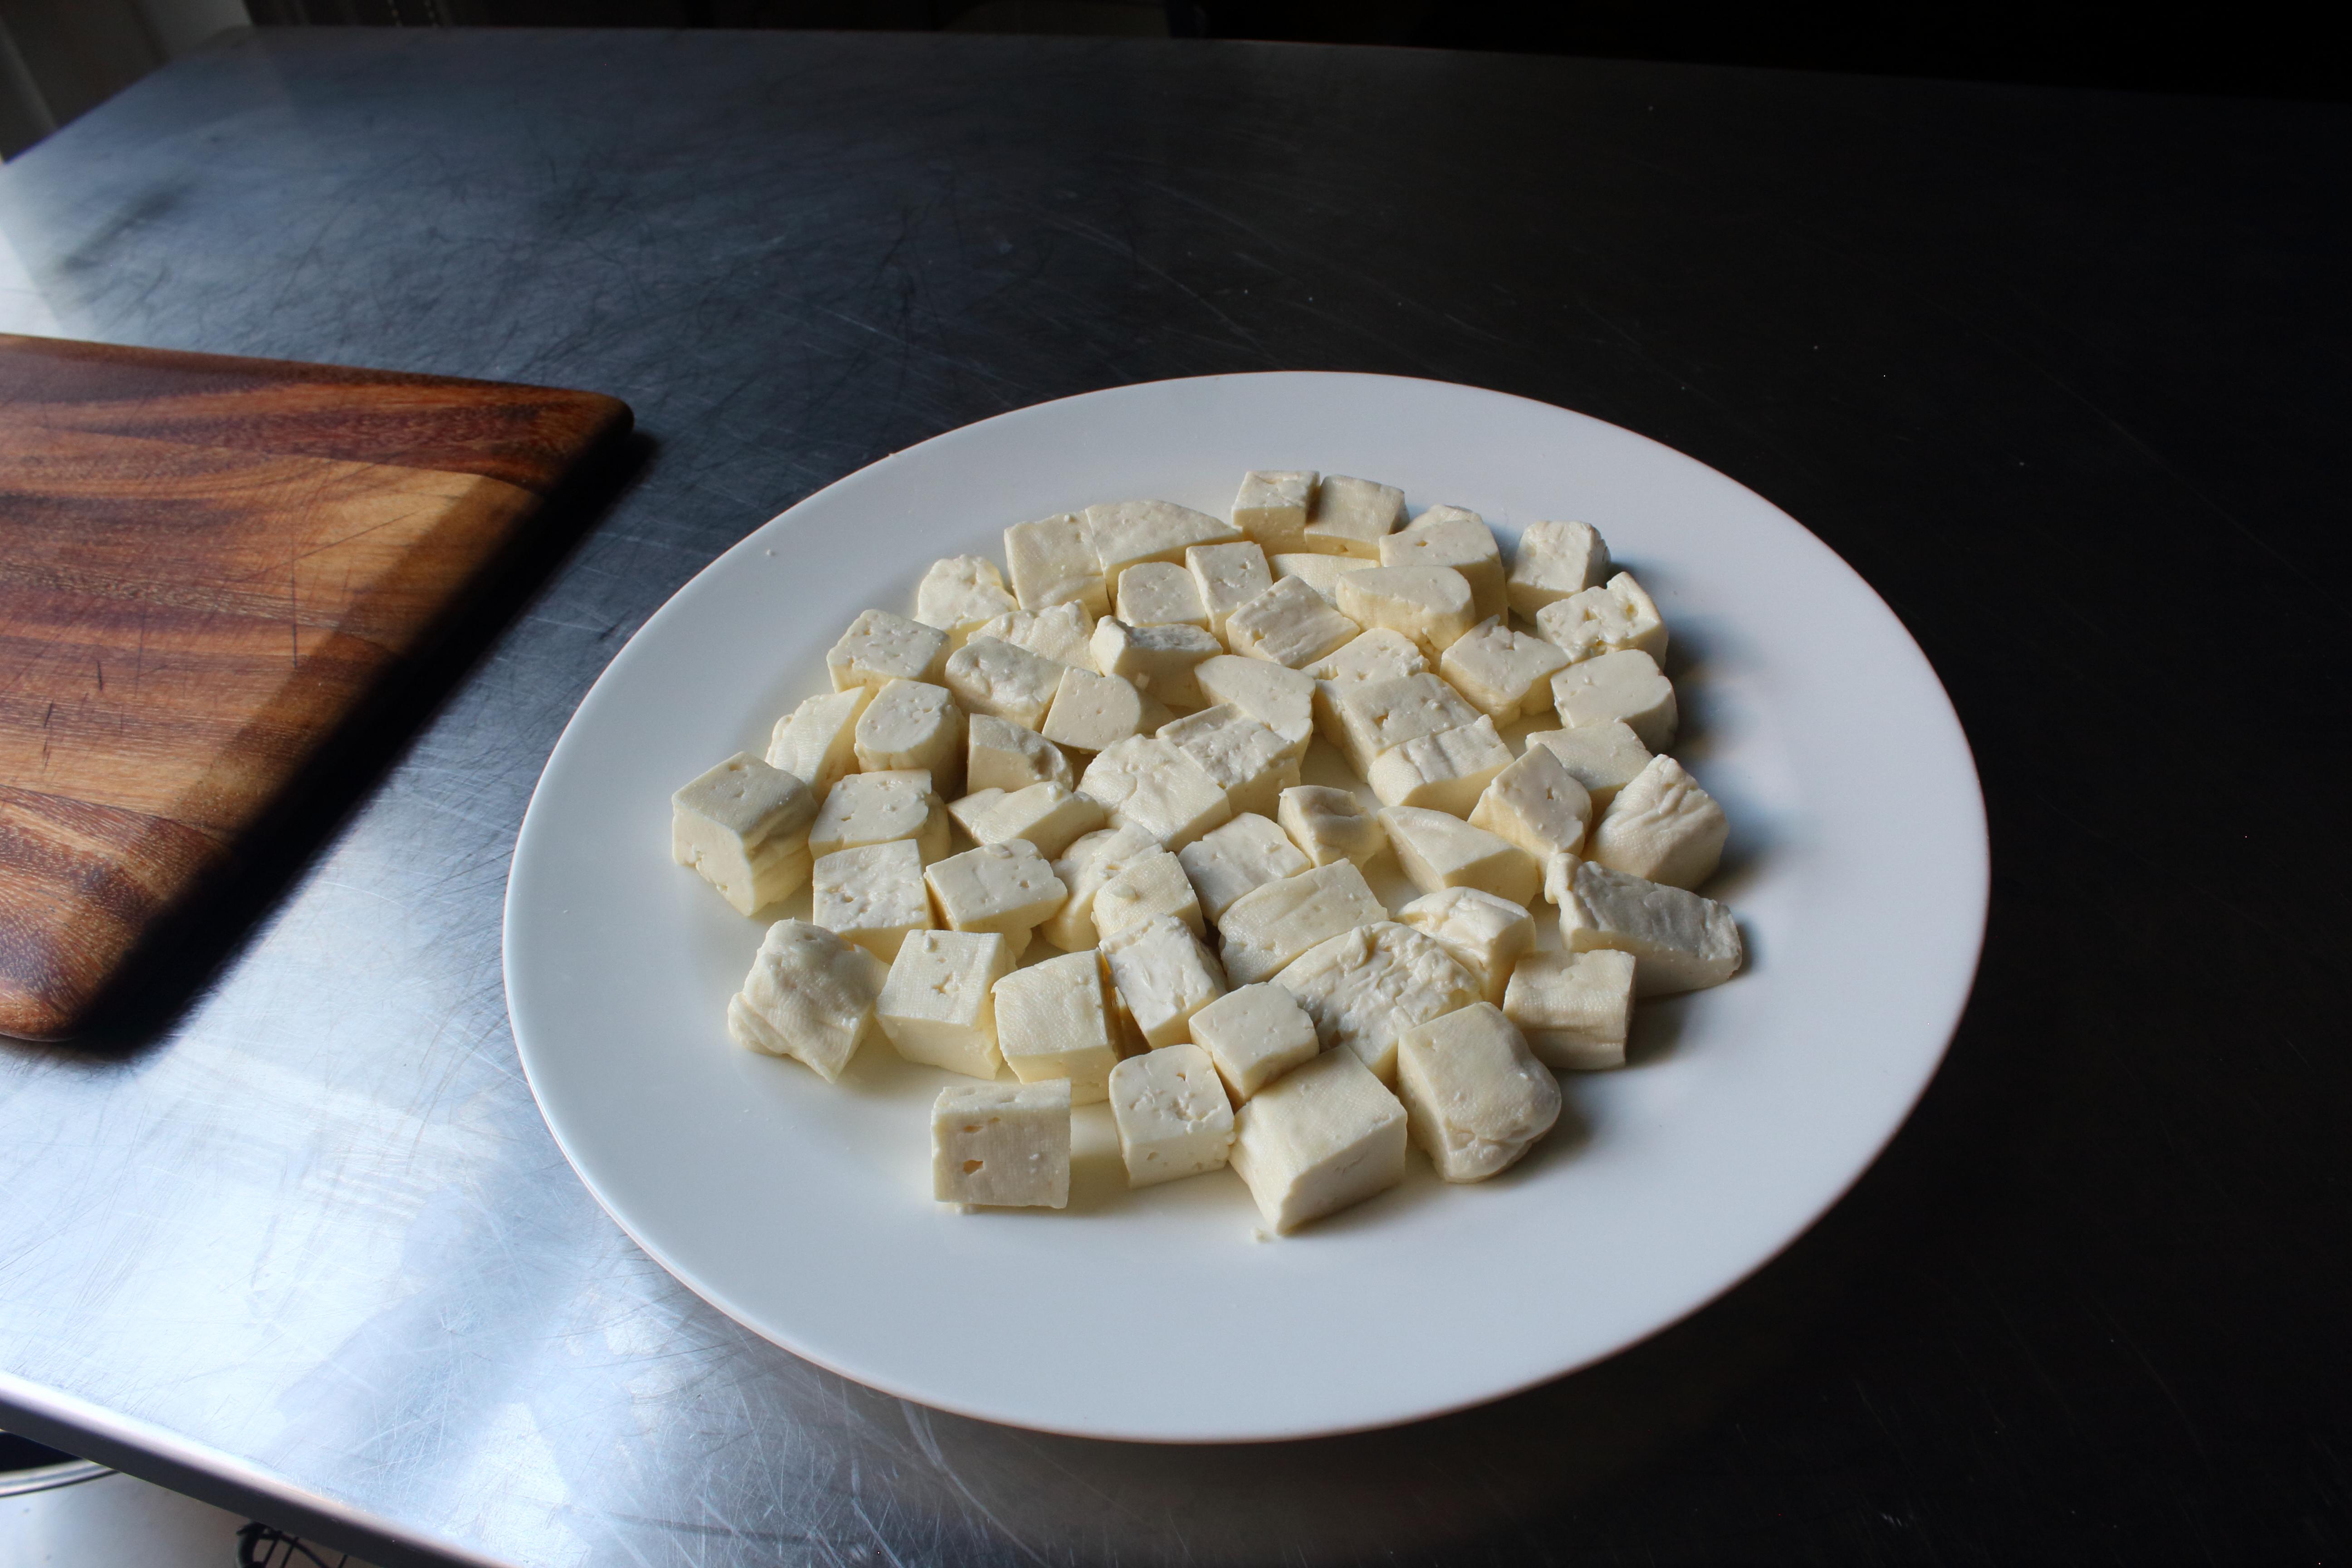 Homemade Cheese Curds Chef John